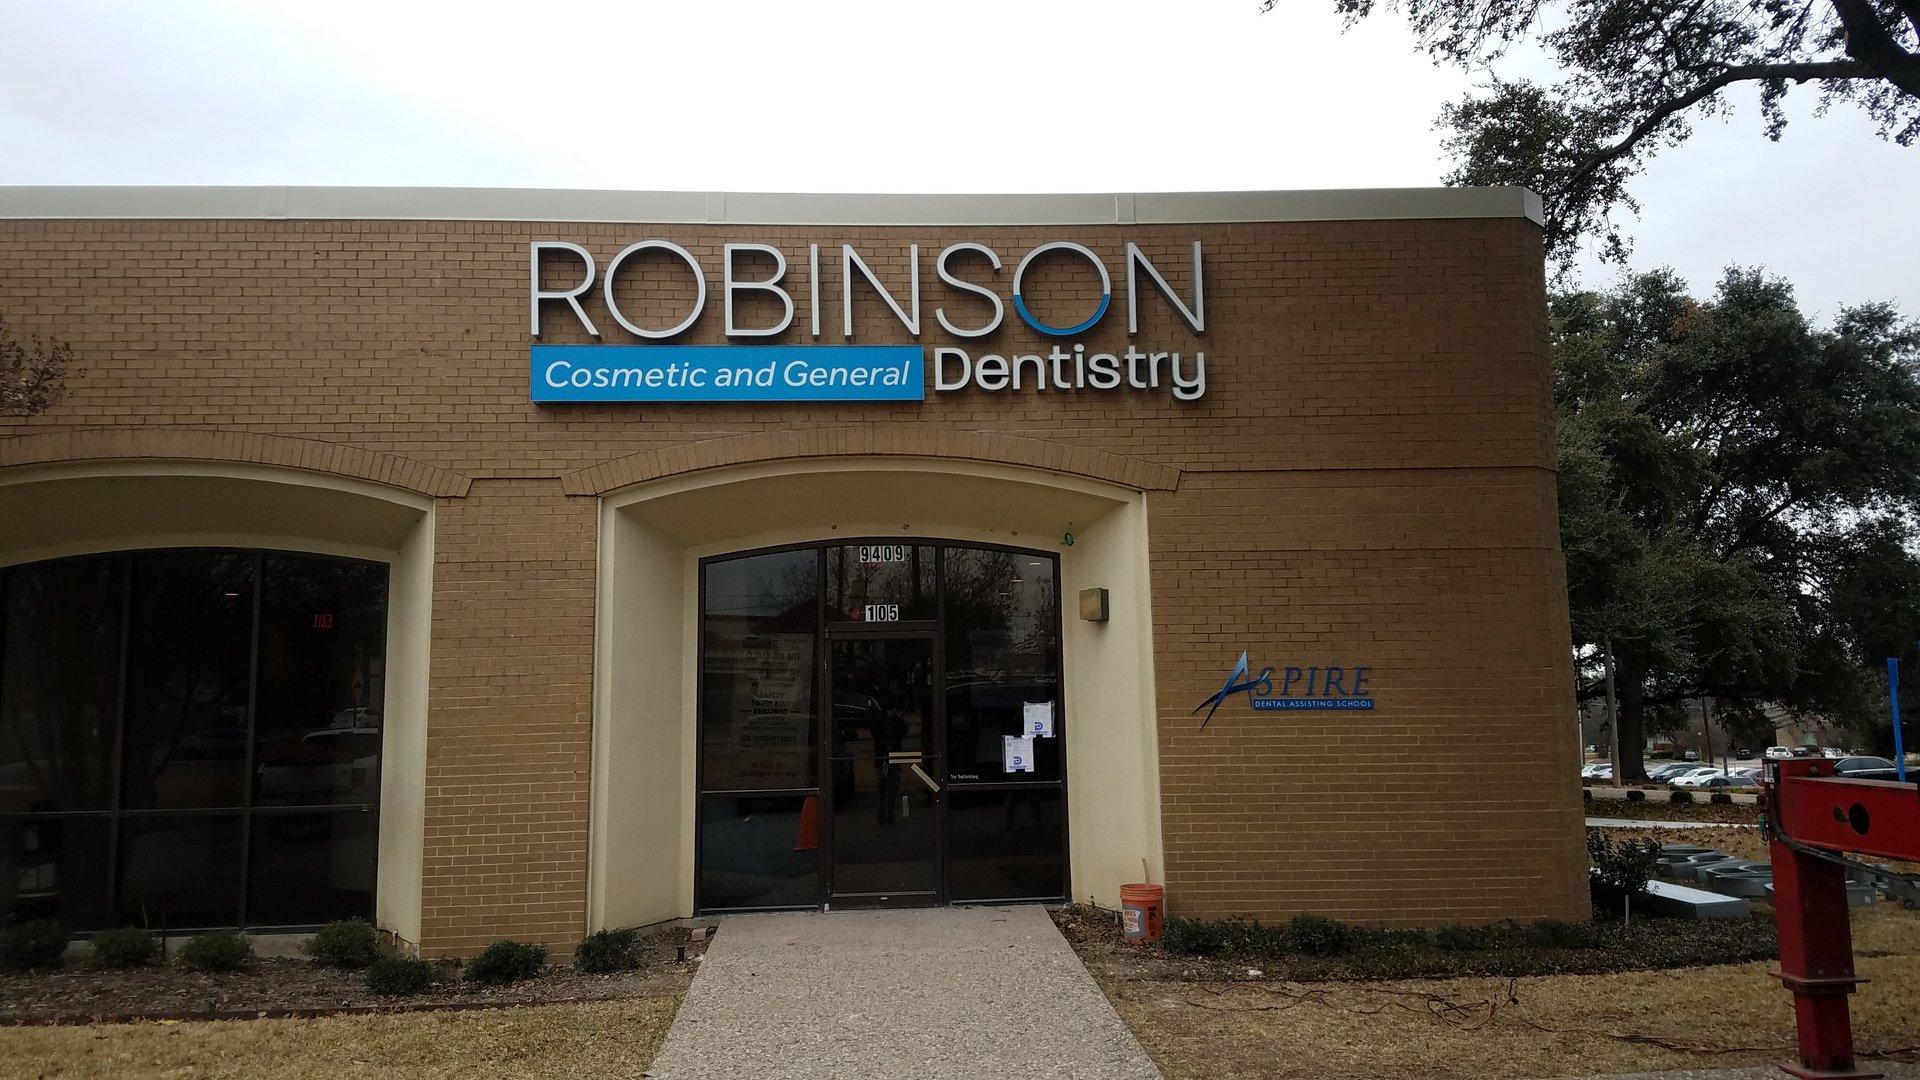 Robinson Dentistry Sign